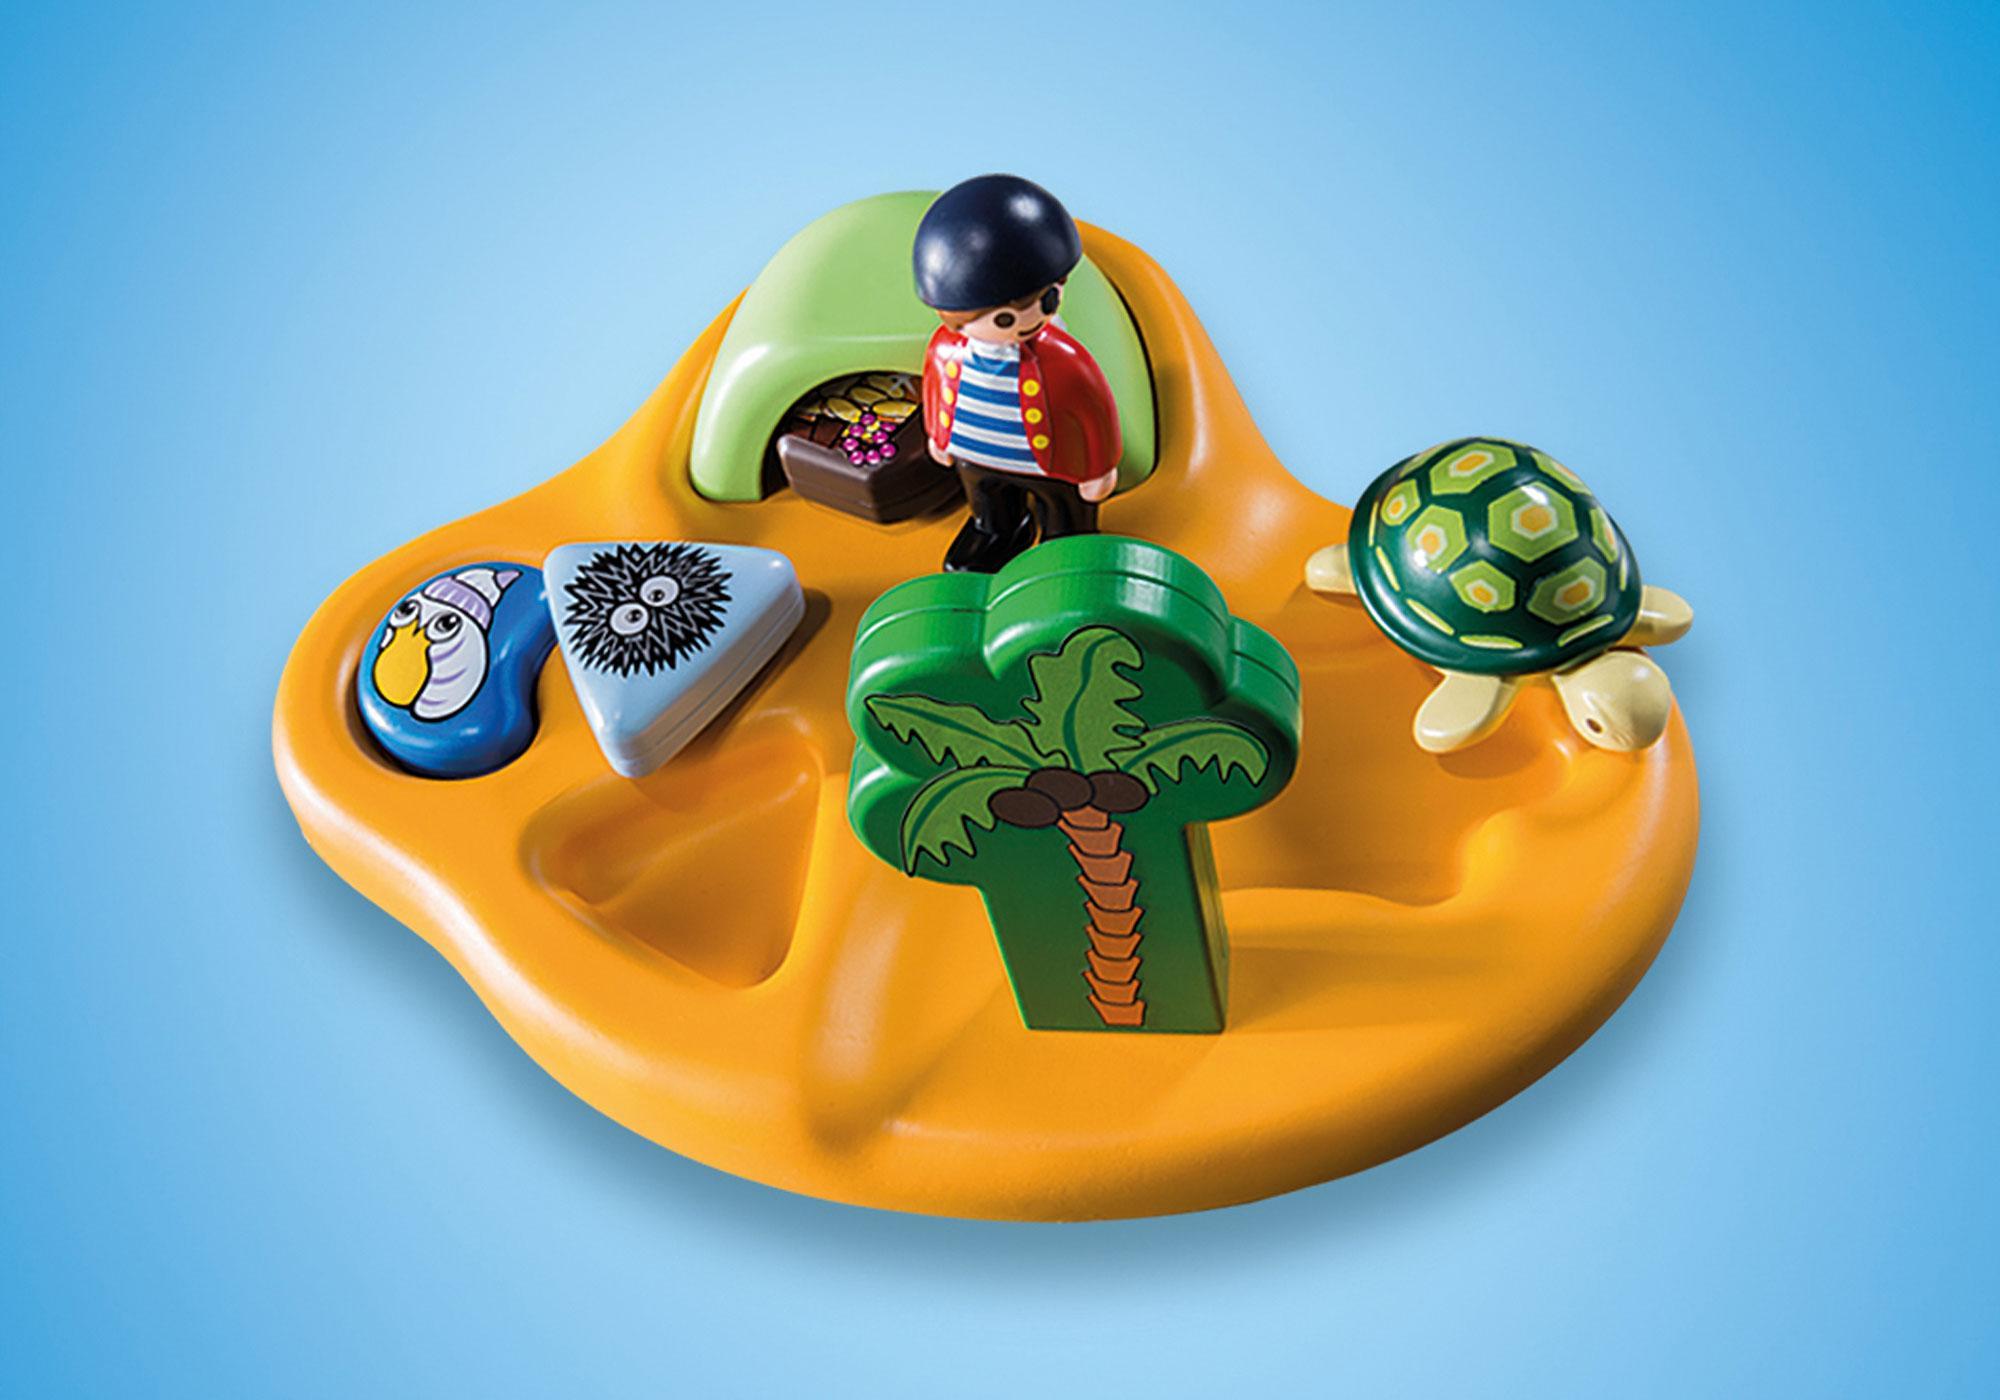 http://media.playmobil.com/i/playmobil/9119_product_extra2/Pirate Island